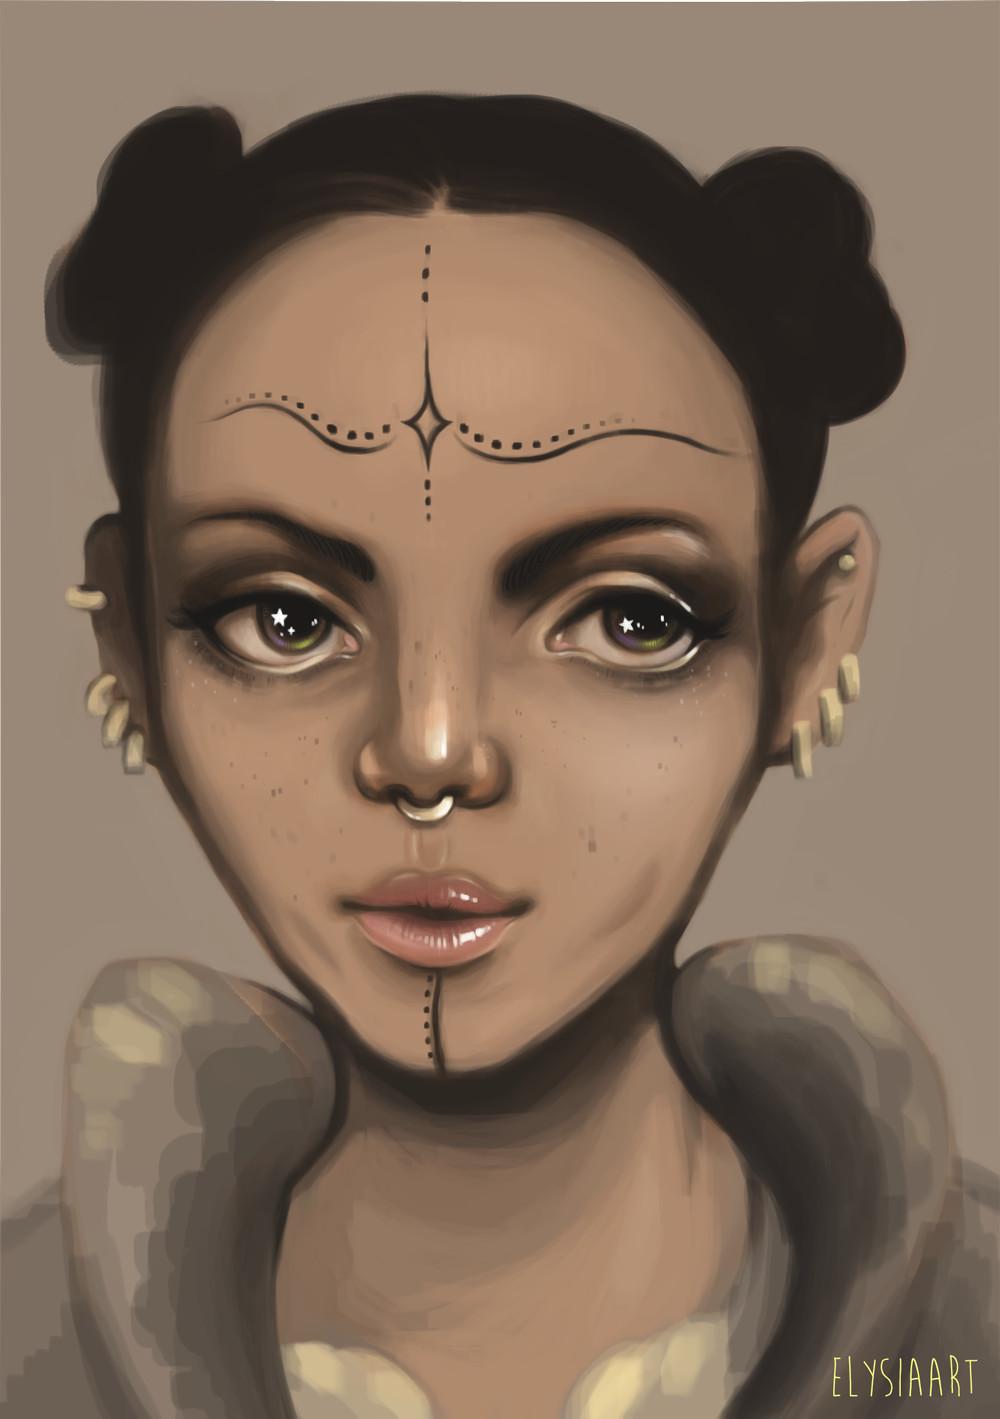 Elysia womersley painting2